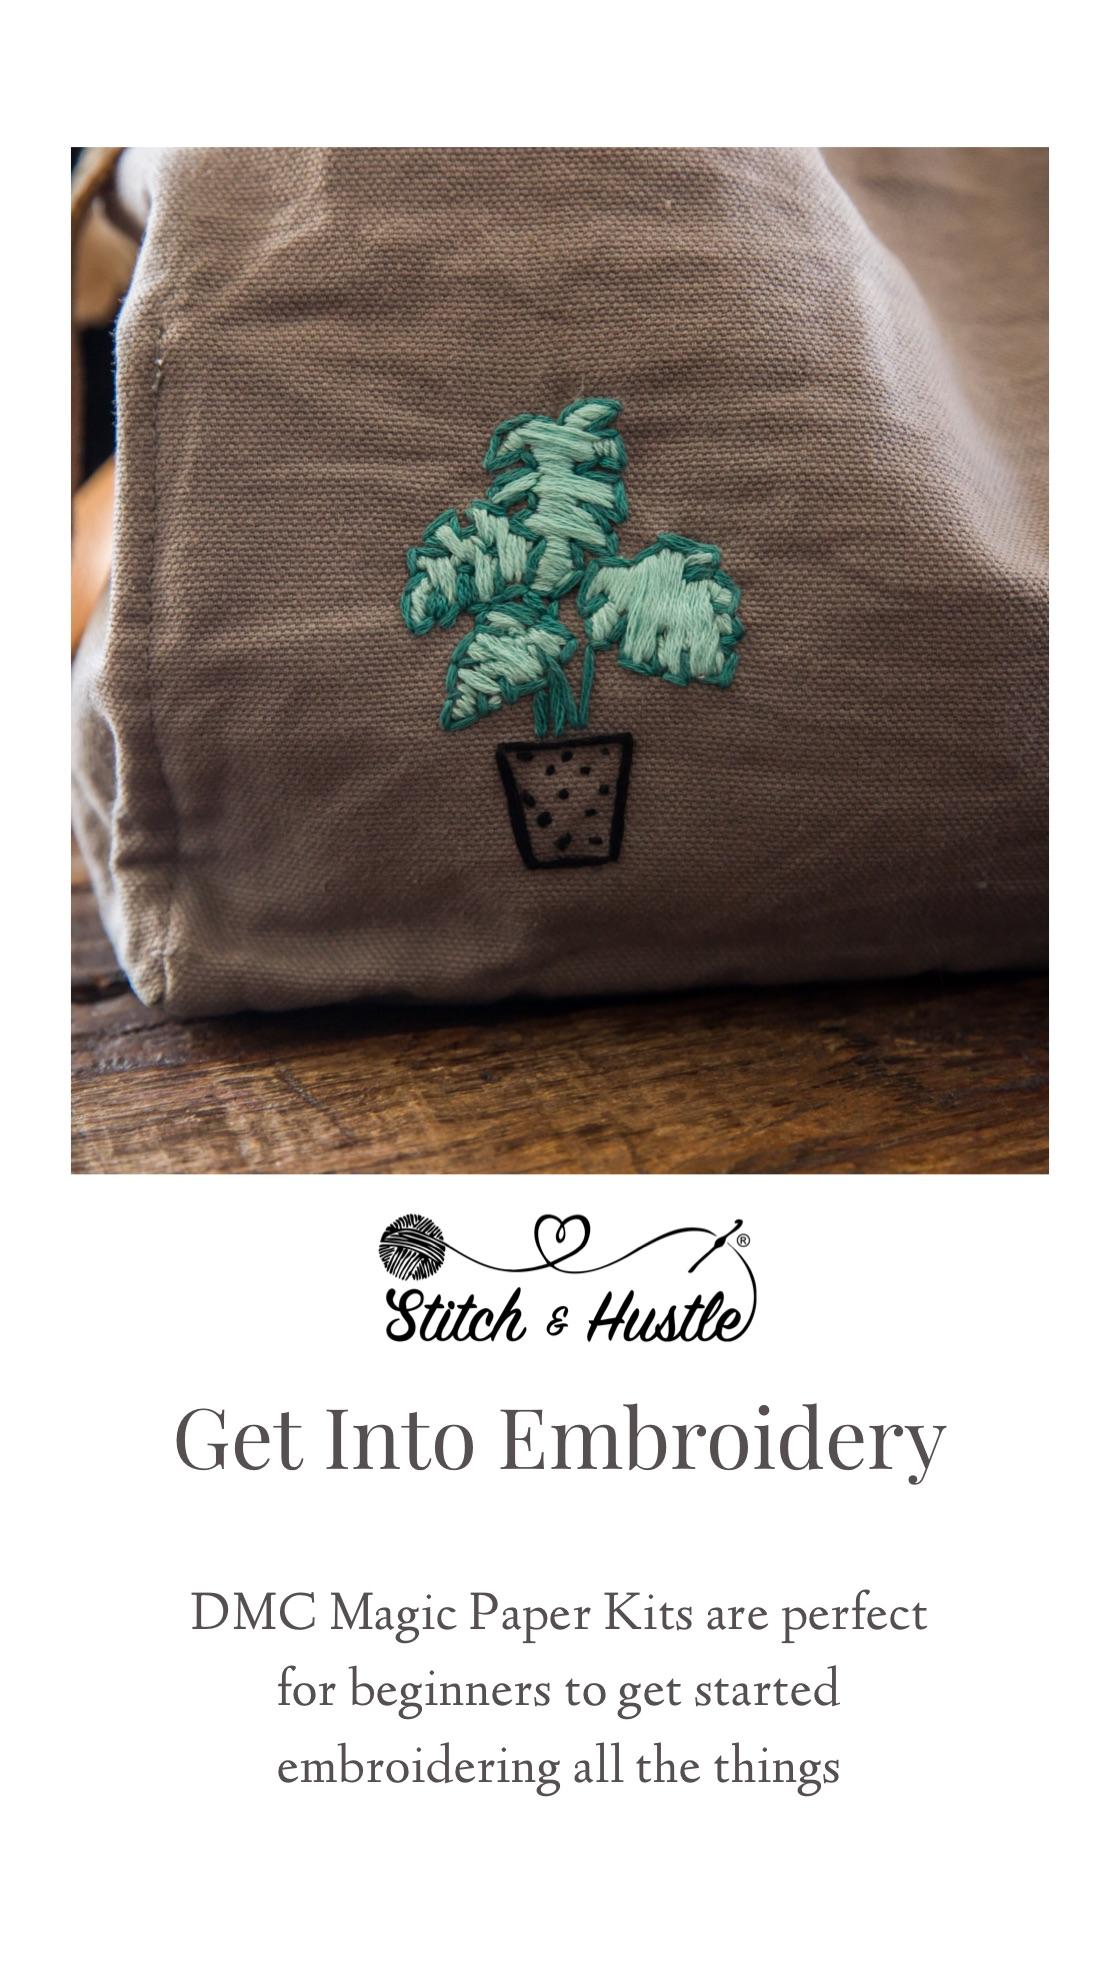 DMC_EmbroideryBlogPost_1s.jpg